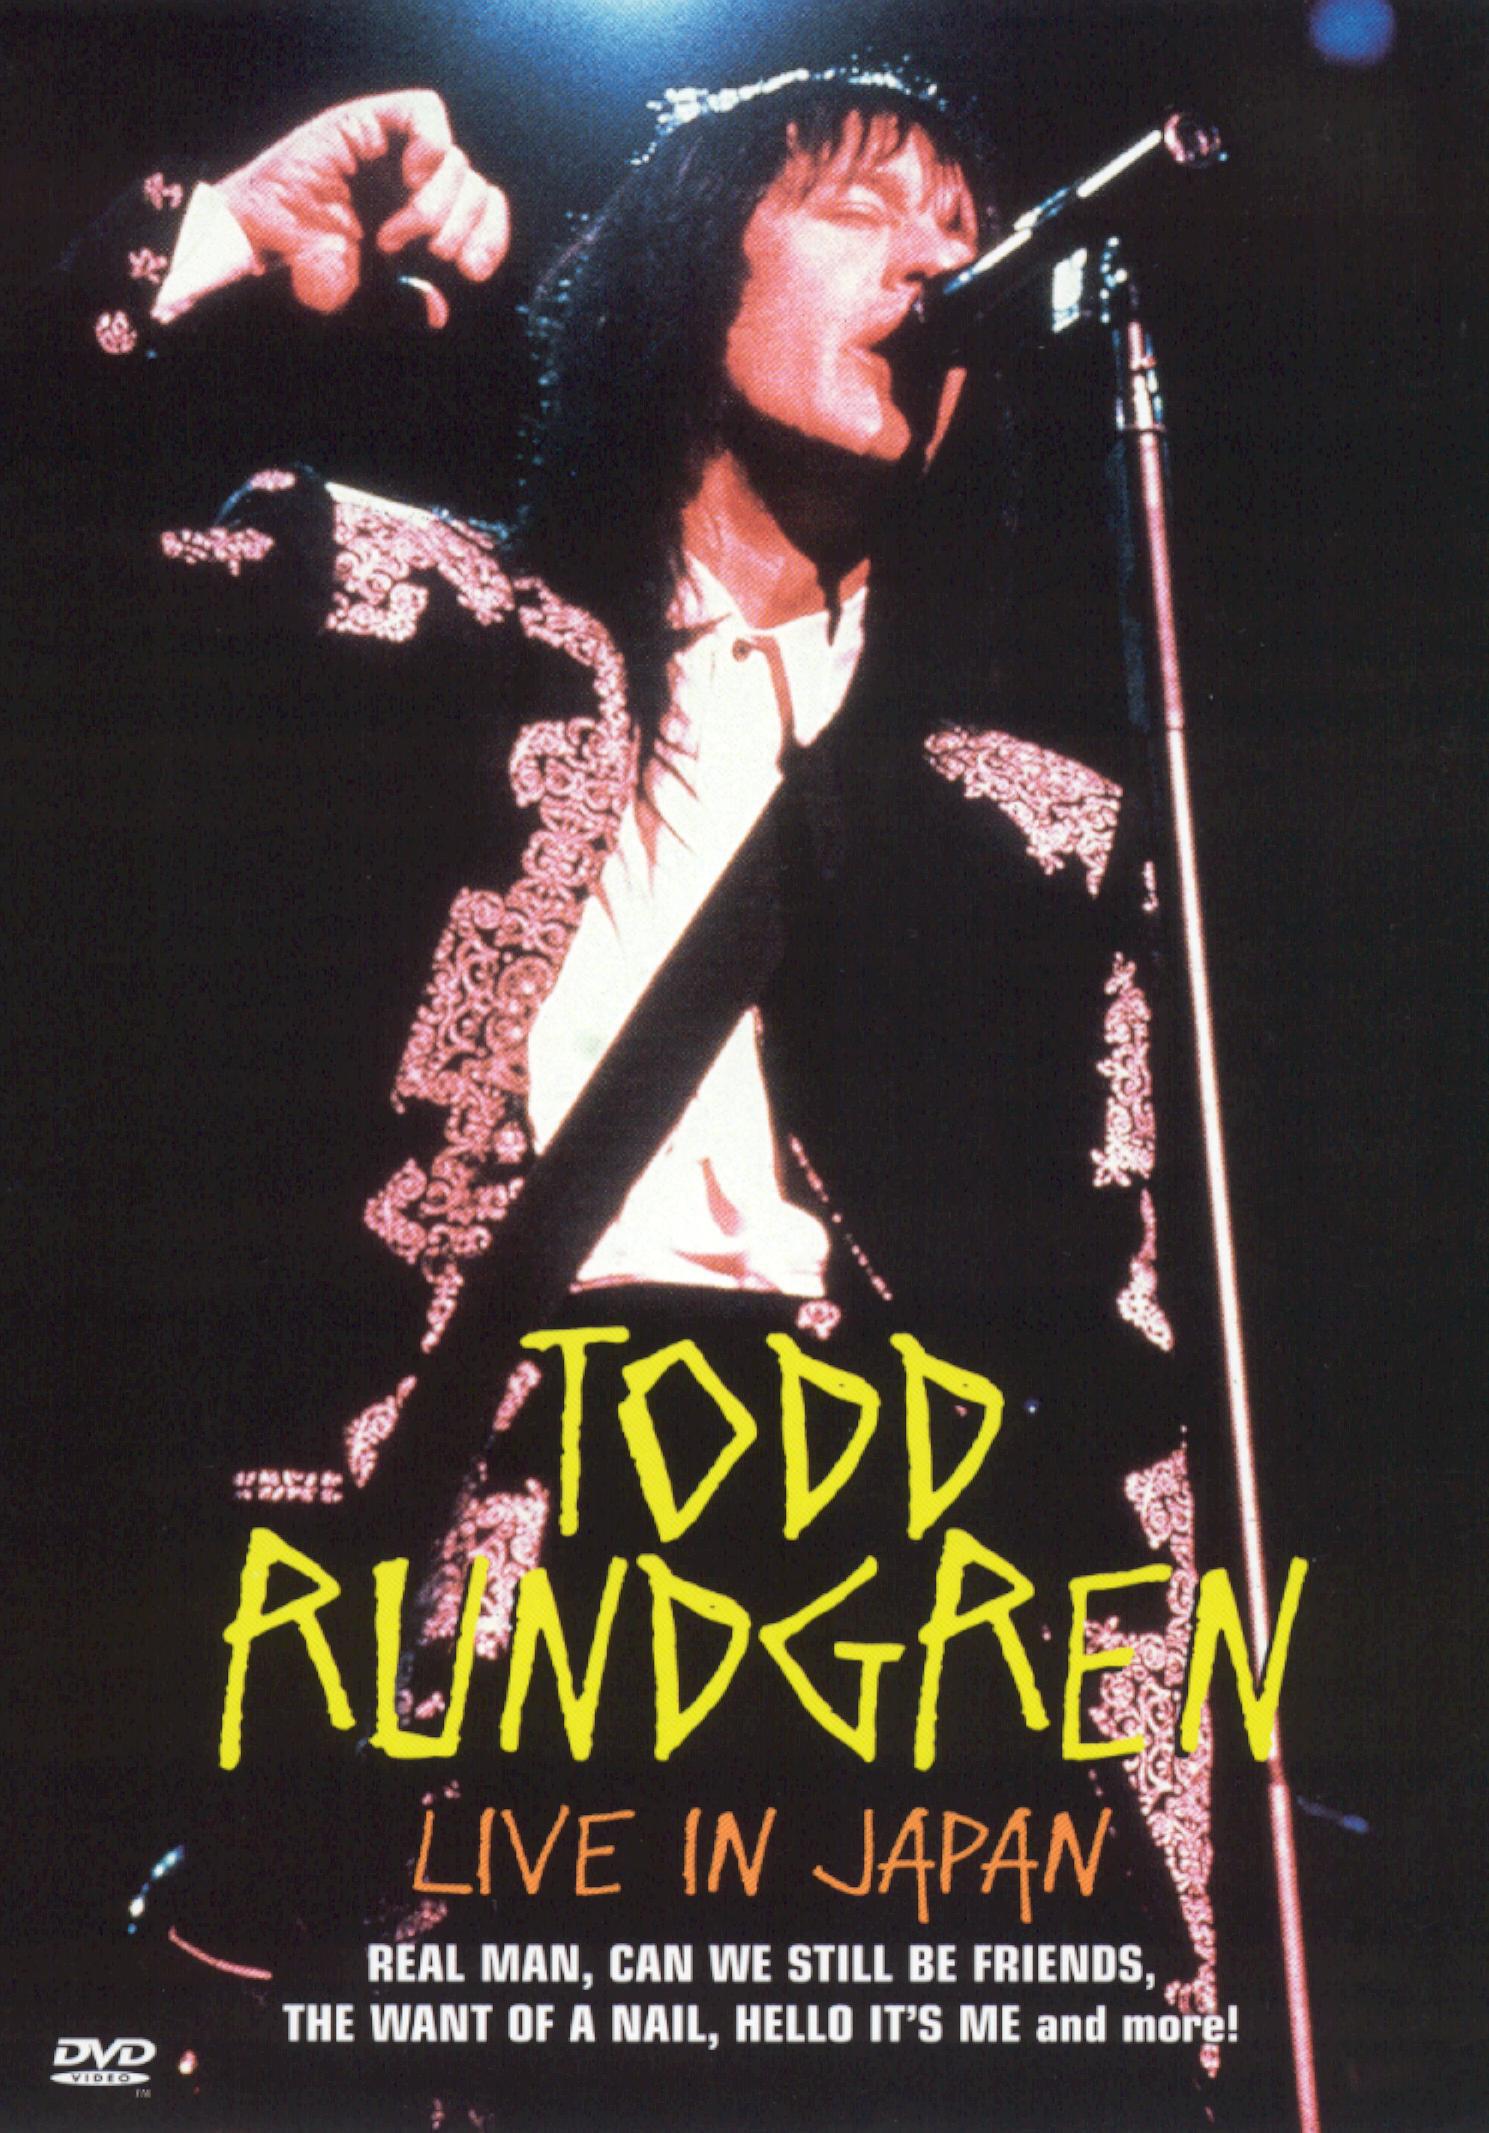 Todd Rundgren: Live in Japan